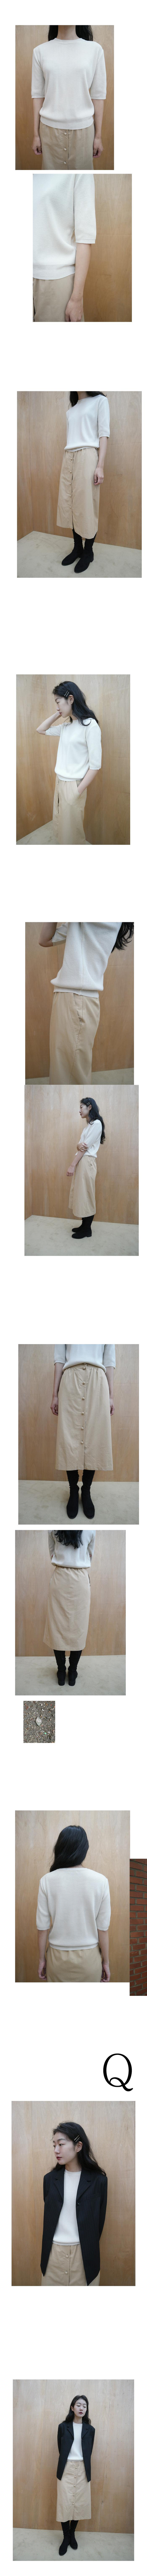 front button cotton skirt